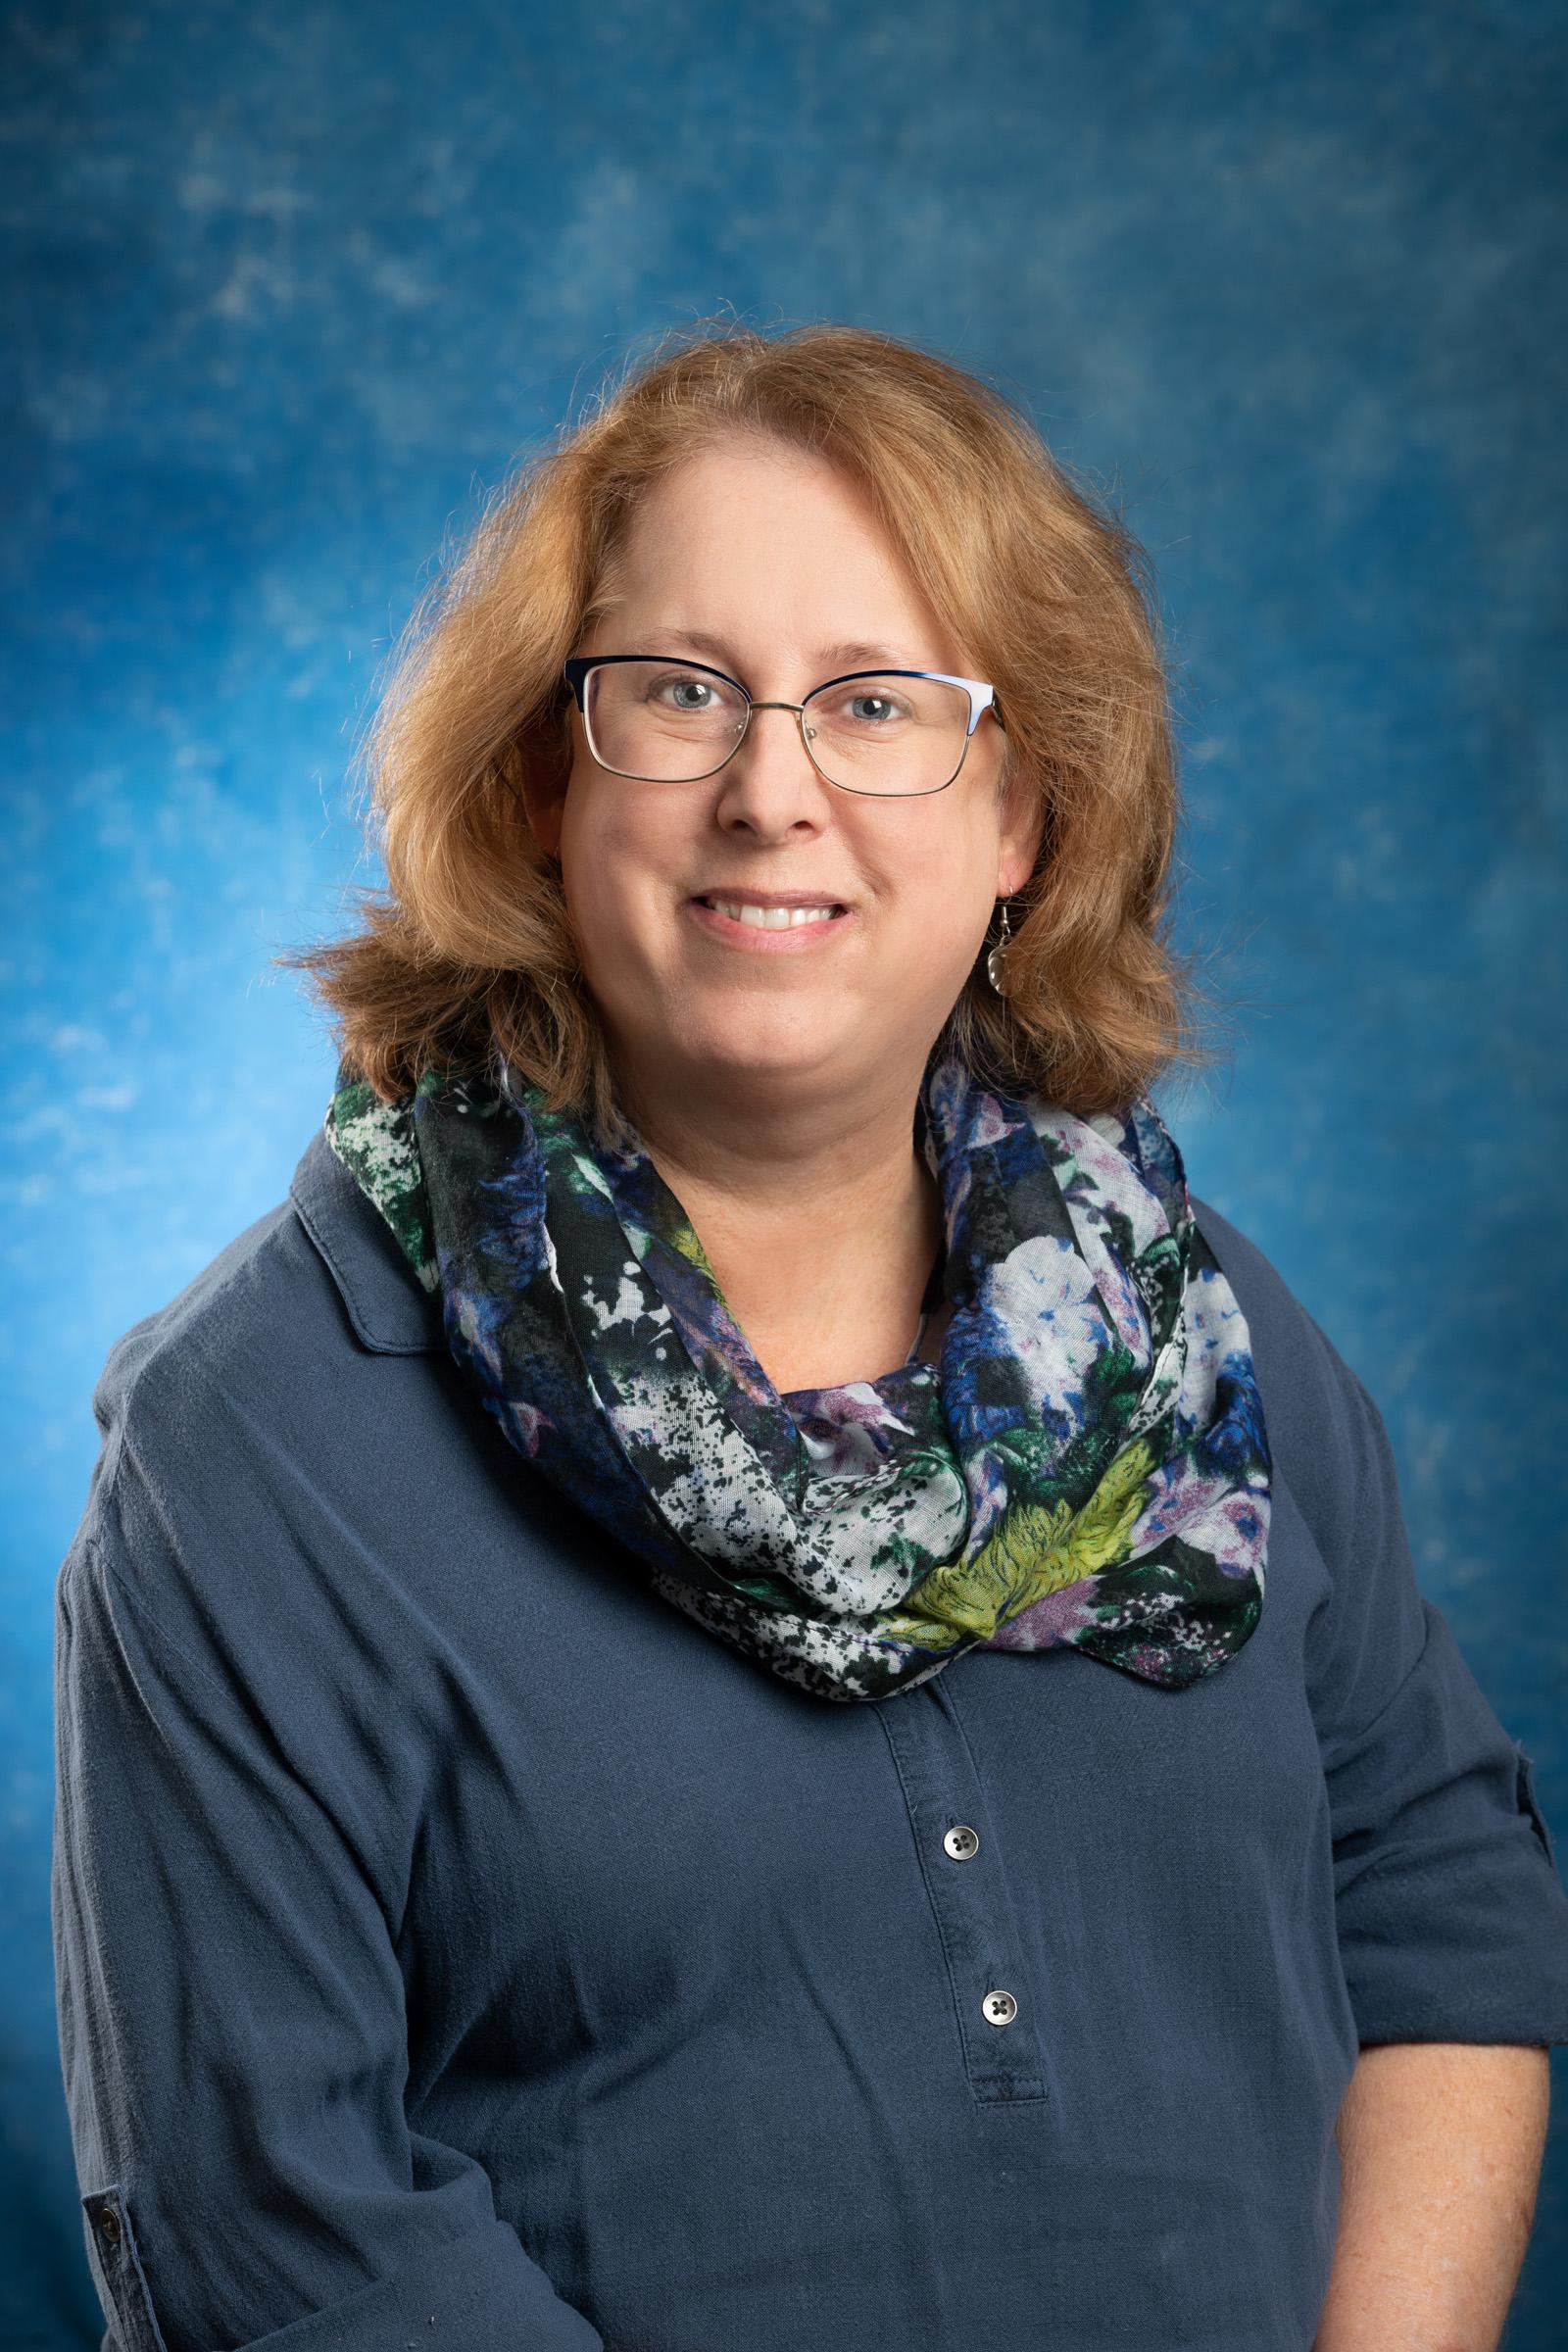 Dr. Kristin Kruse, Associates in Women's Health Care of Pueblo, Colorado